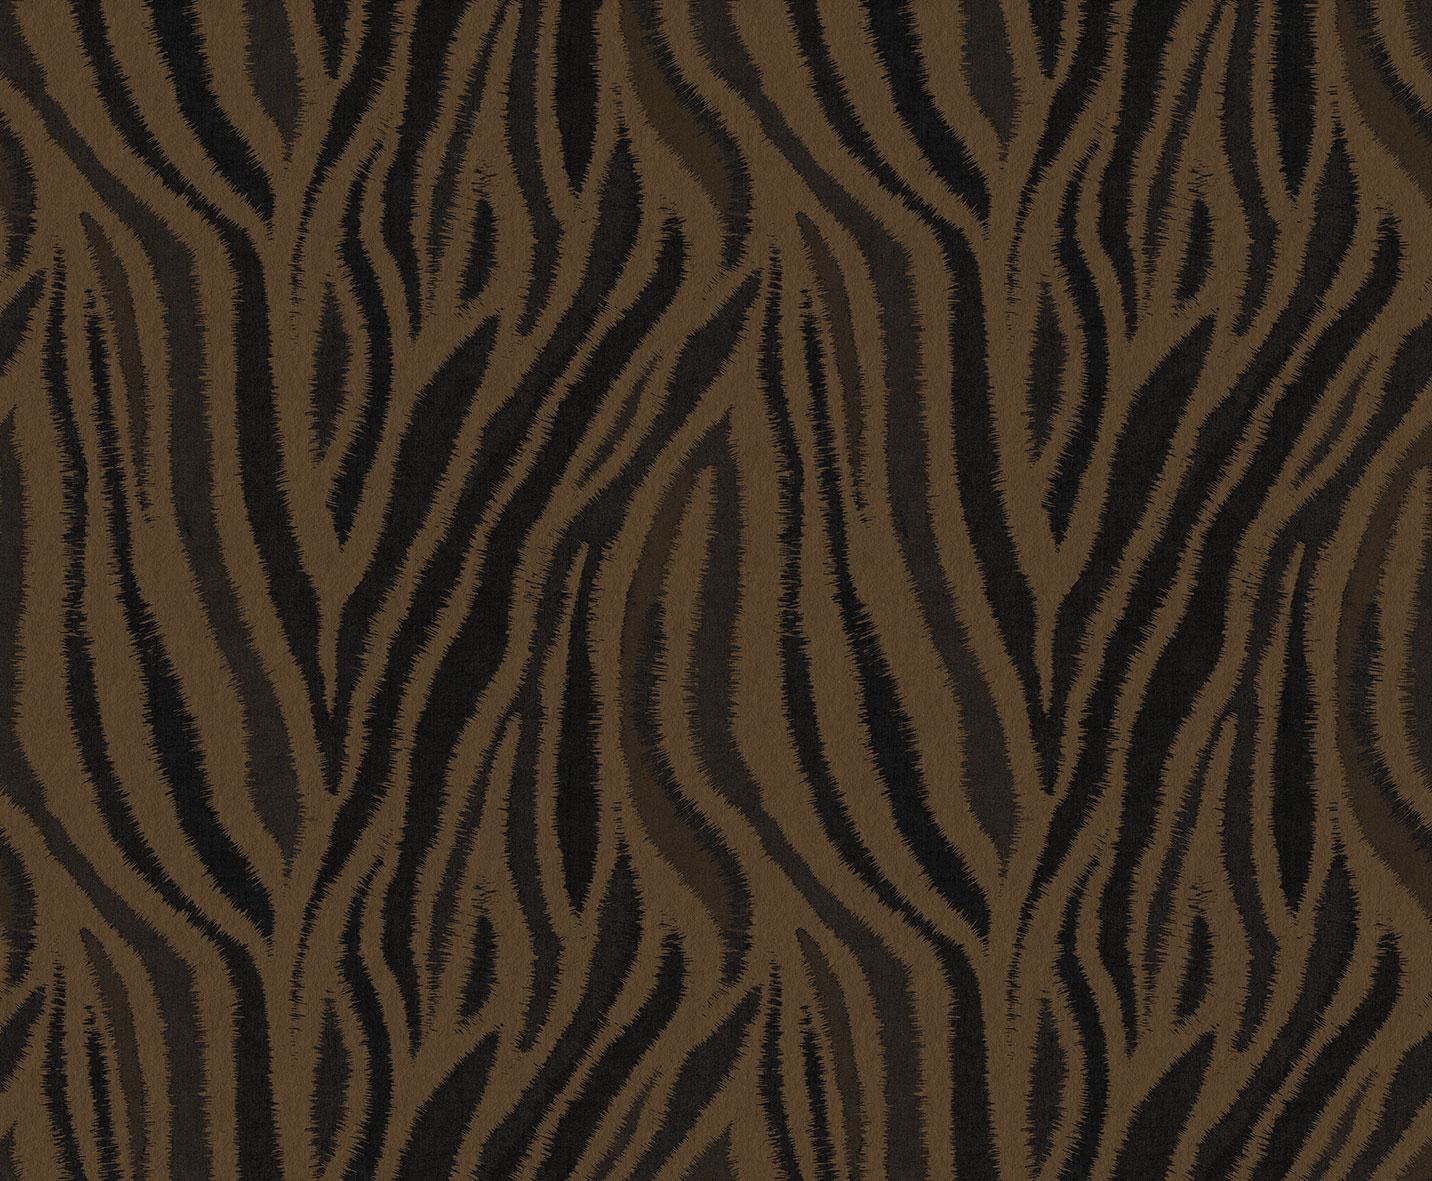 Tapet Primordial stripes | LONDON ART